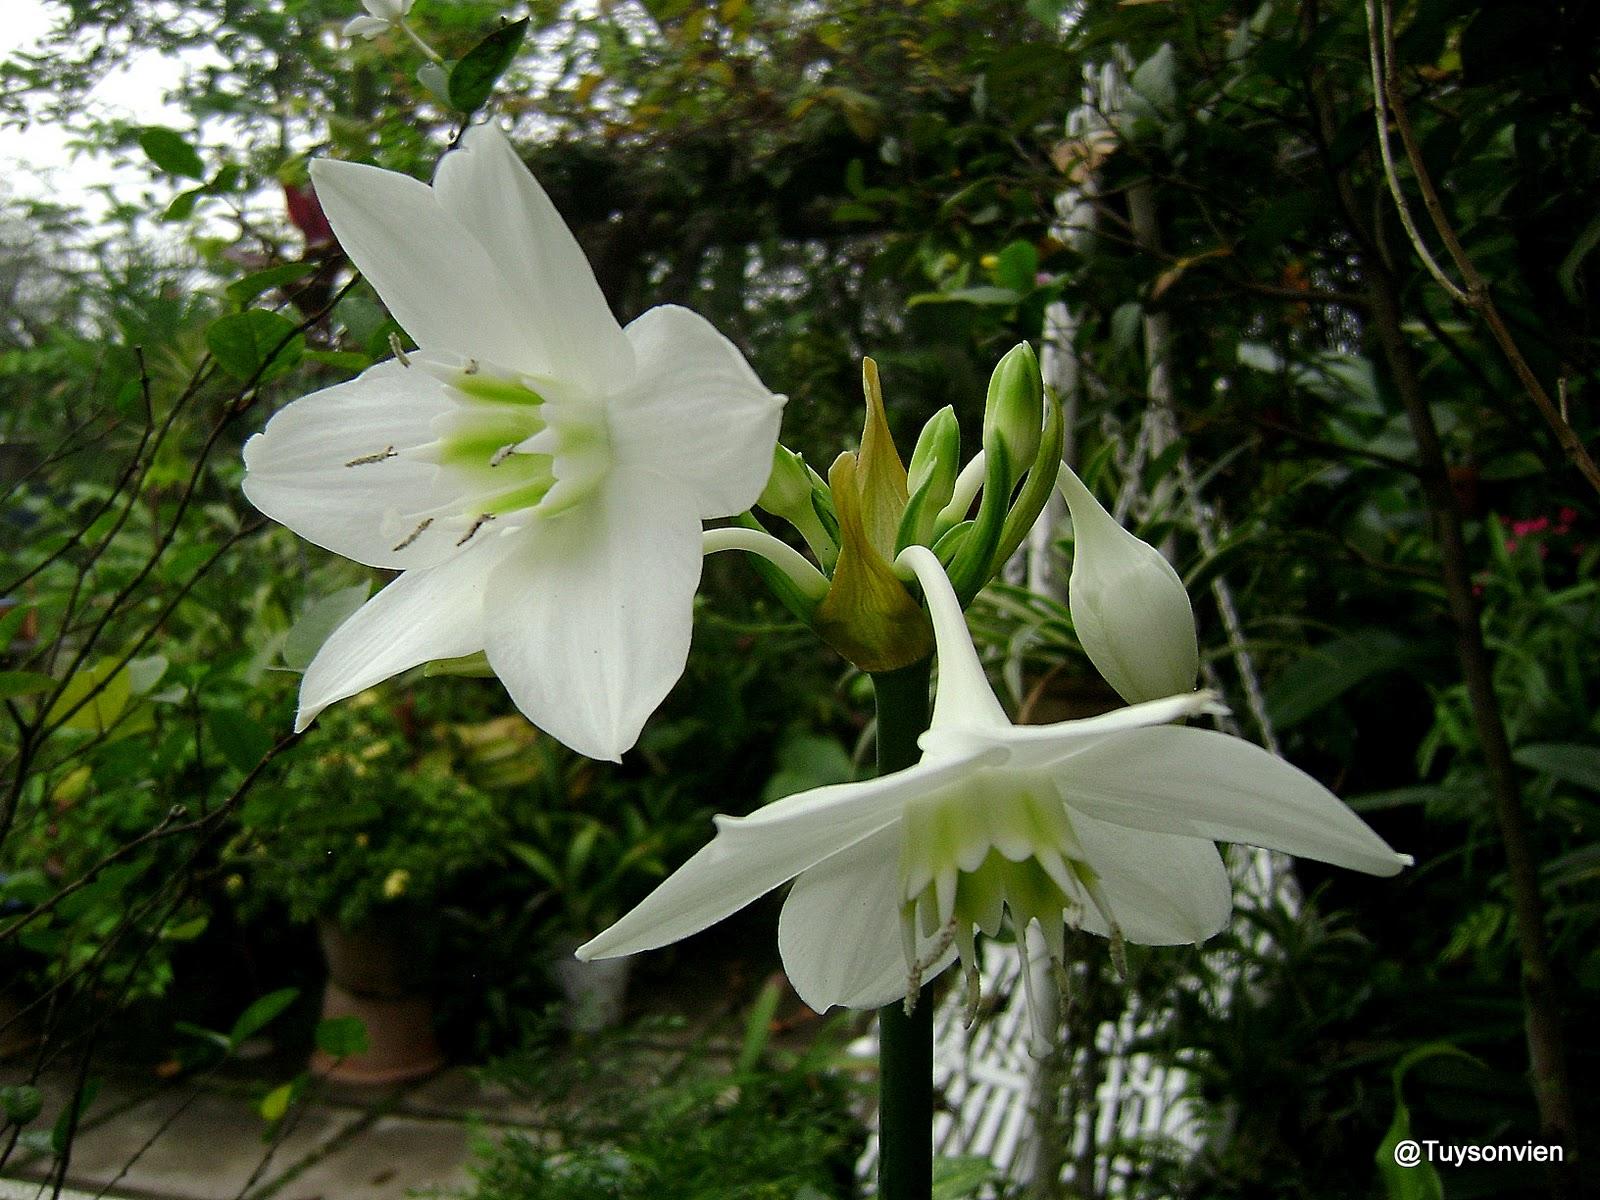 My Garden At Tuy Son Vien Amazon Lily